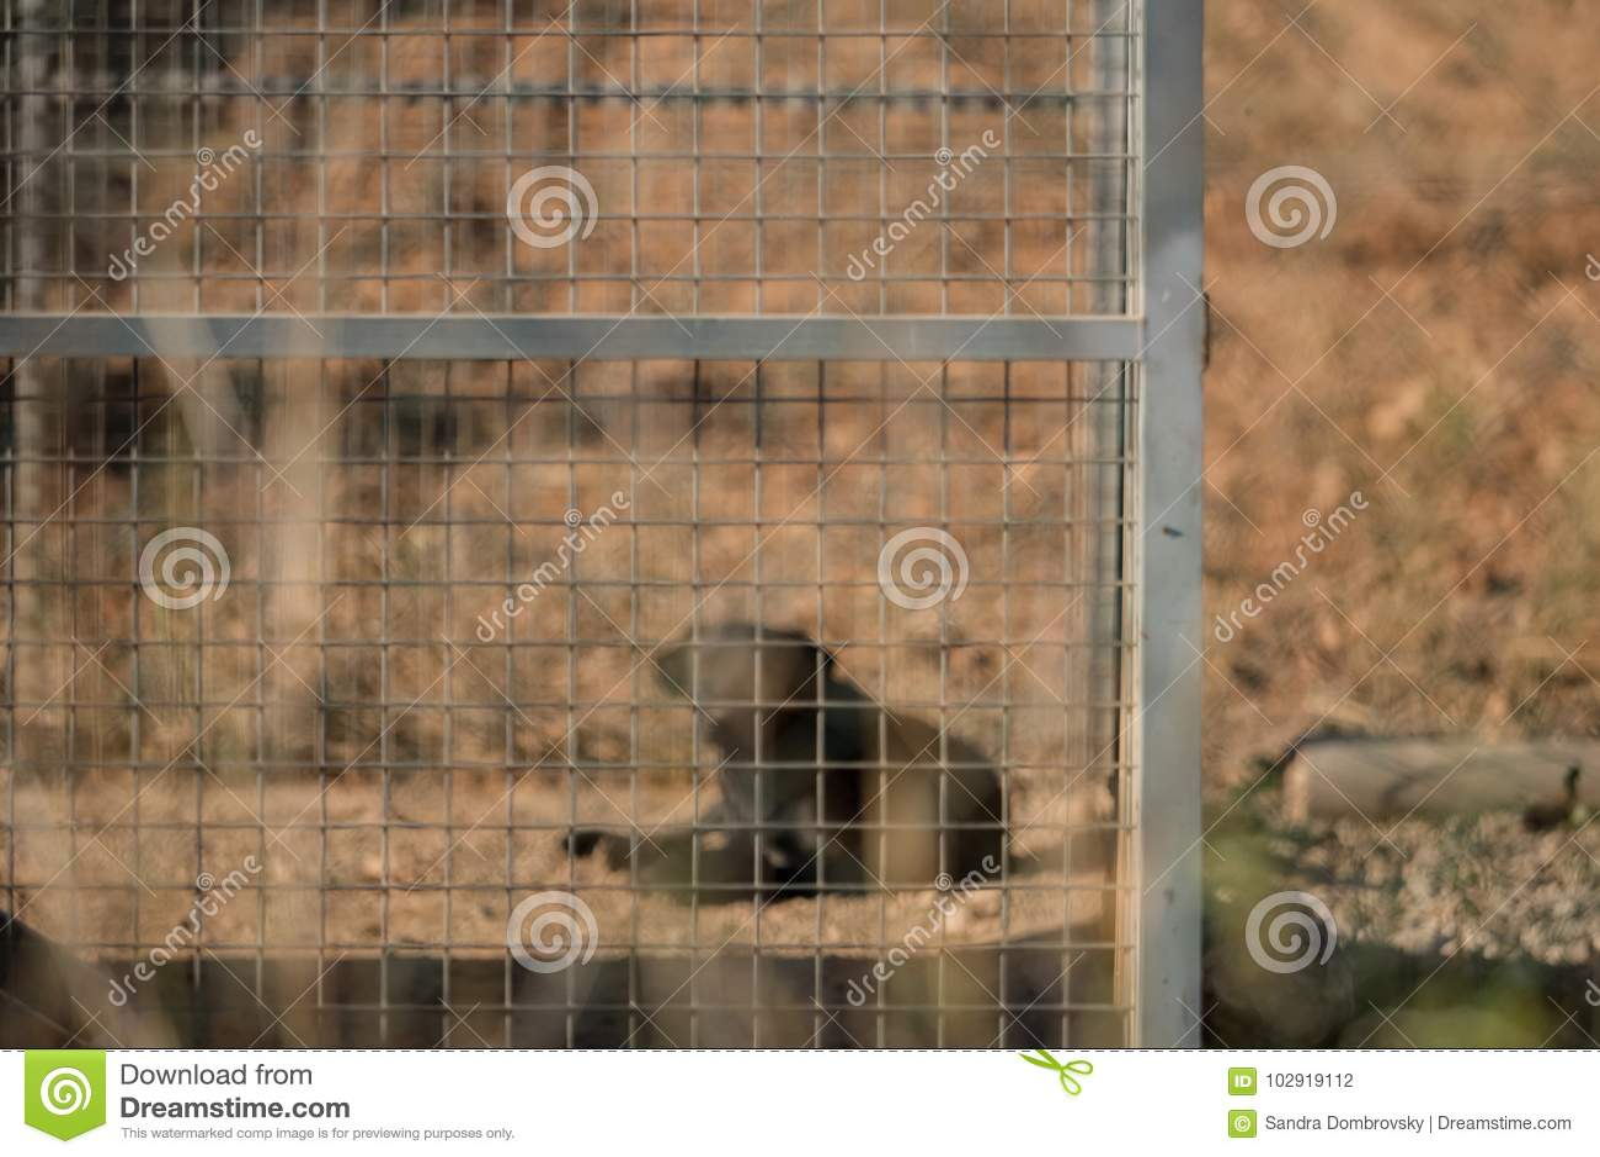 Cão preto no canil